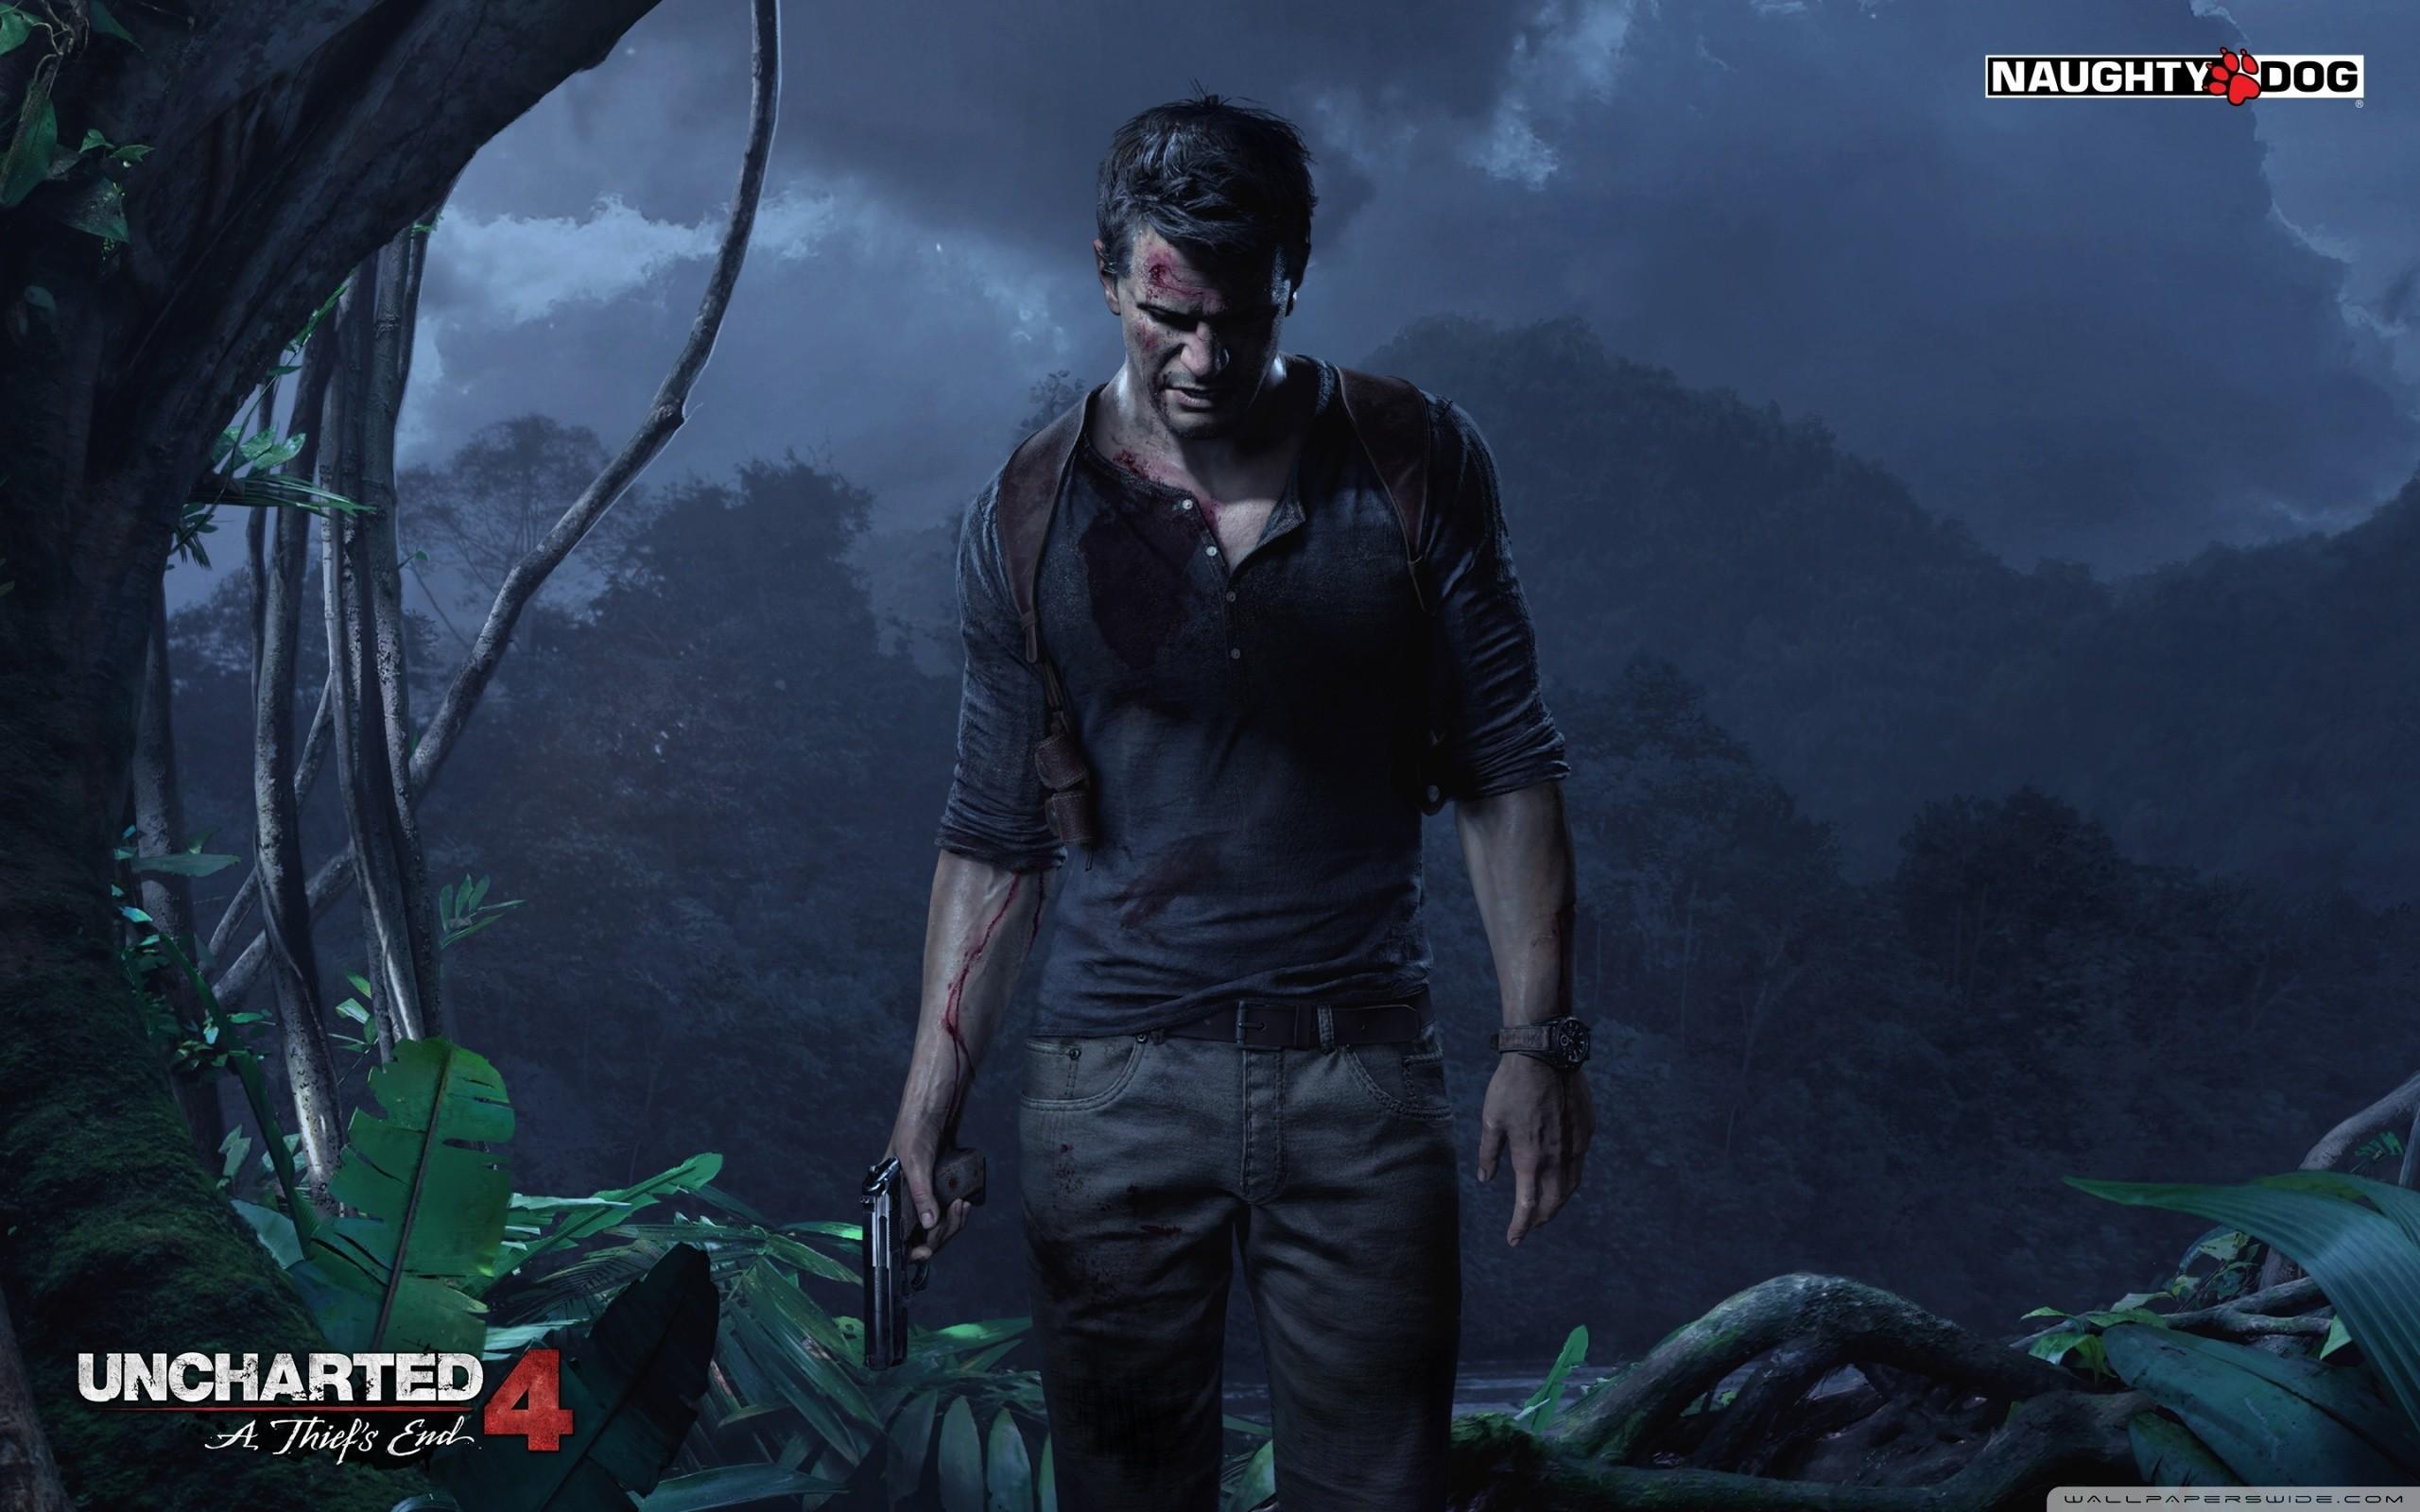 Uncharted 4 A Thief's End Hd Desktop Wallpaper : Widescreen :